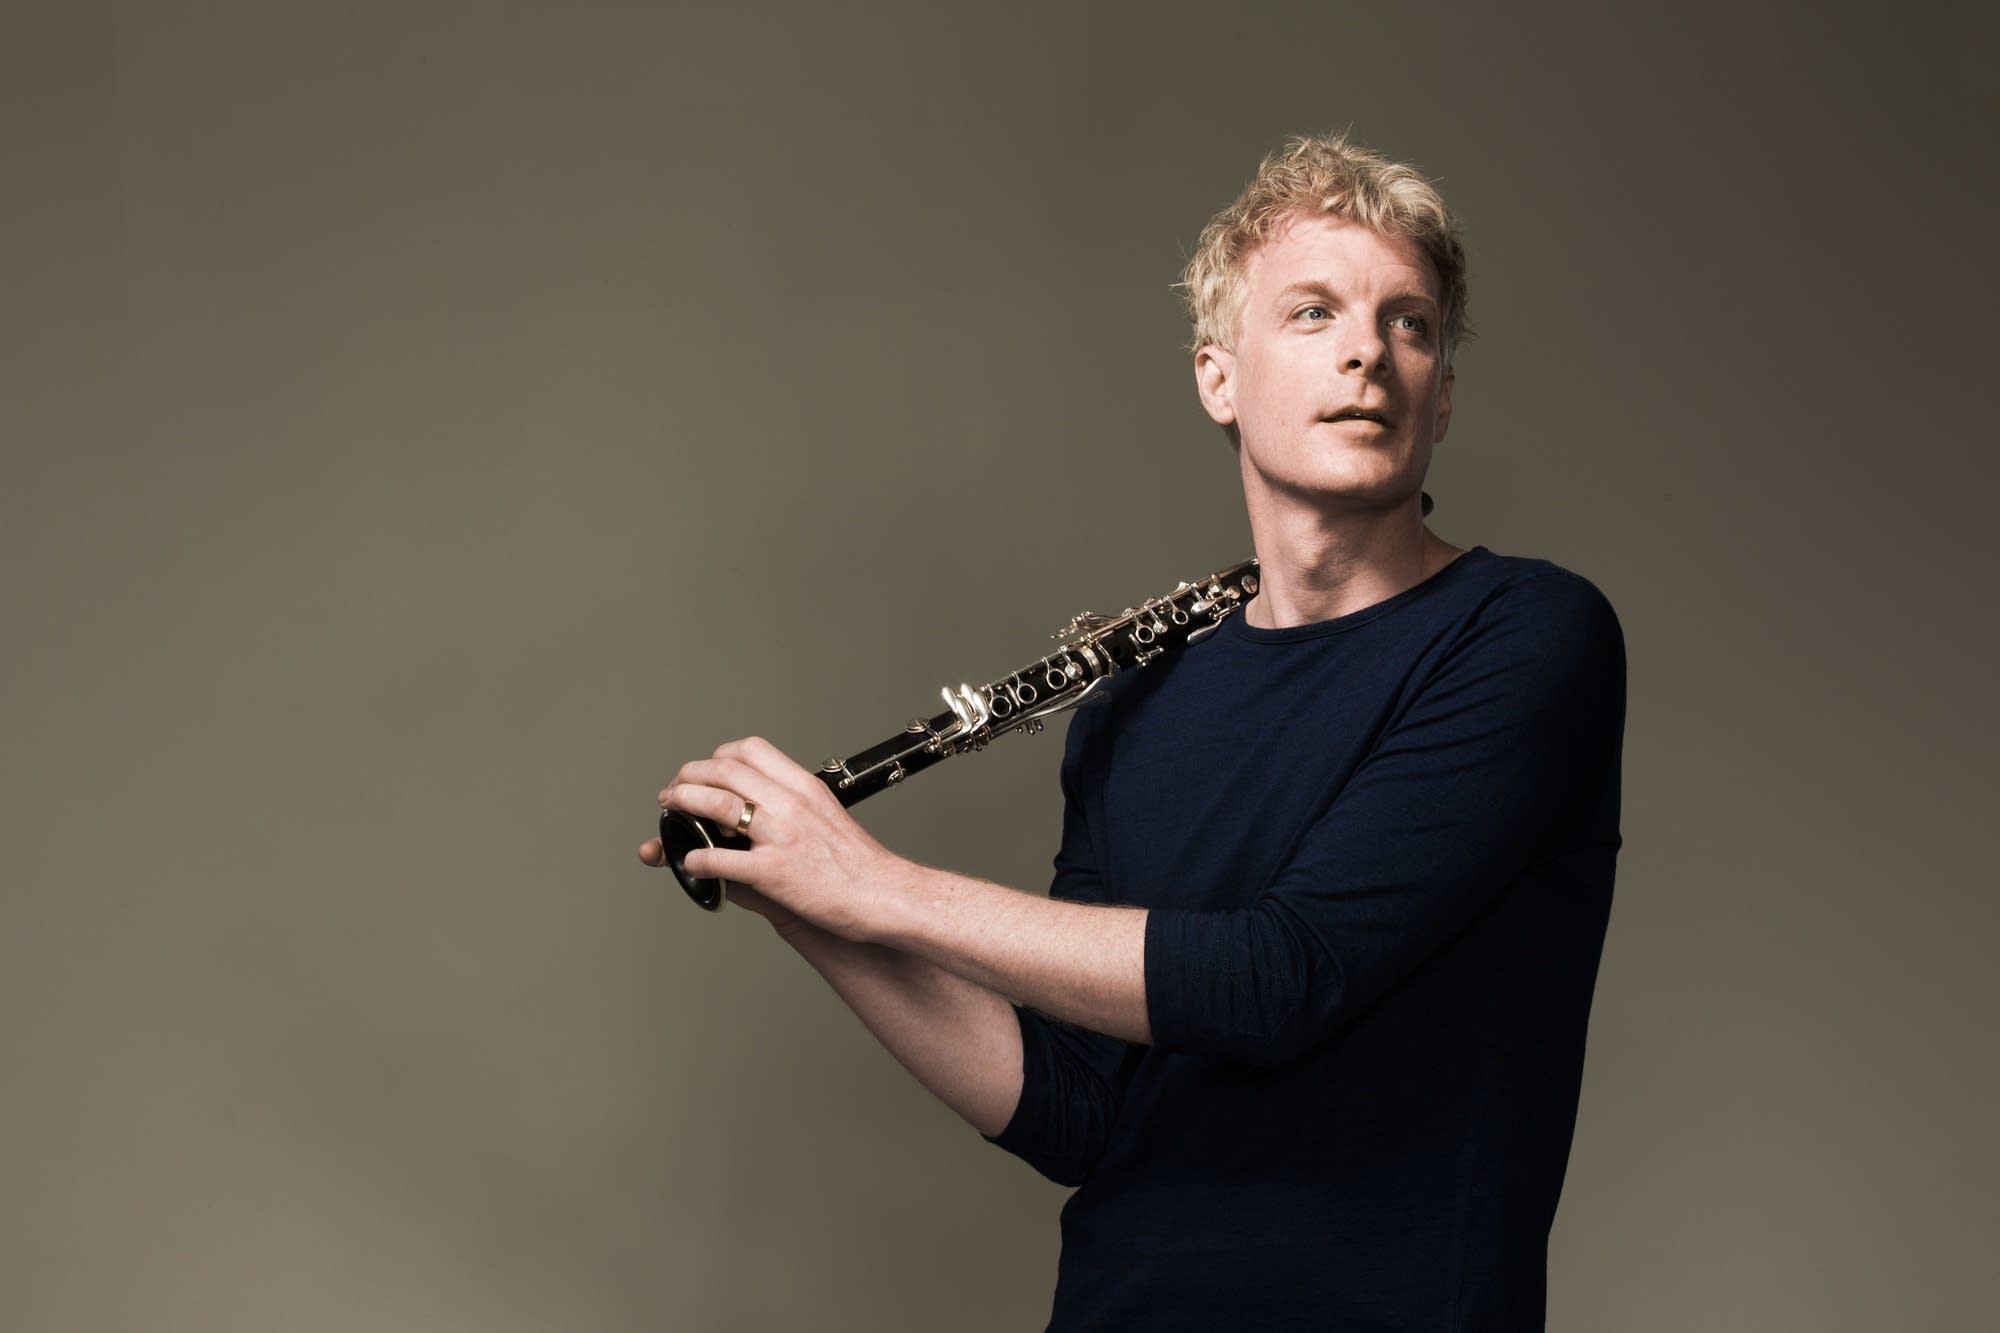 Clarinetist Martin Frost